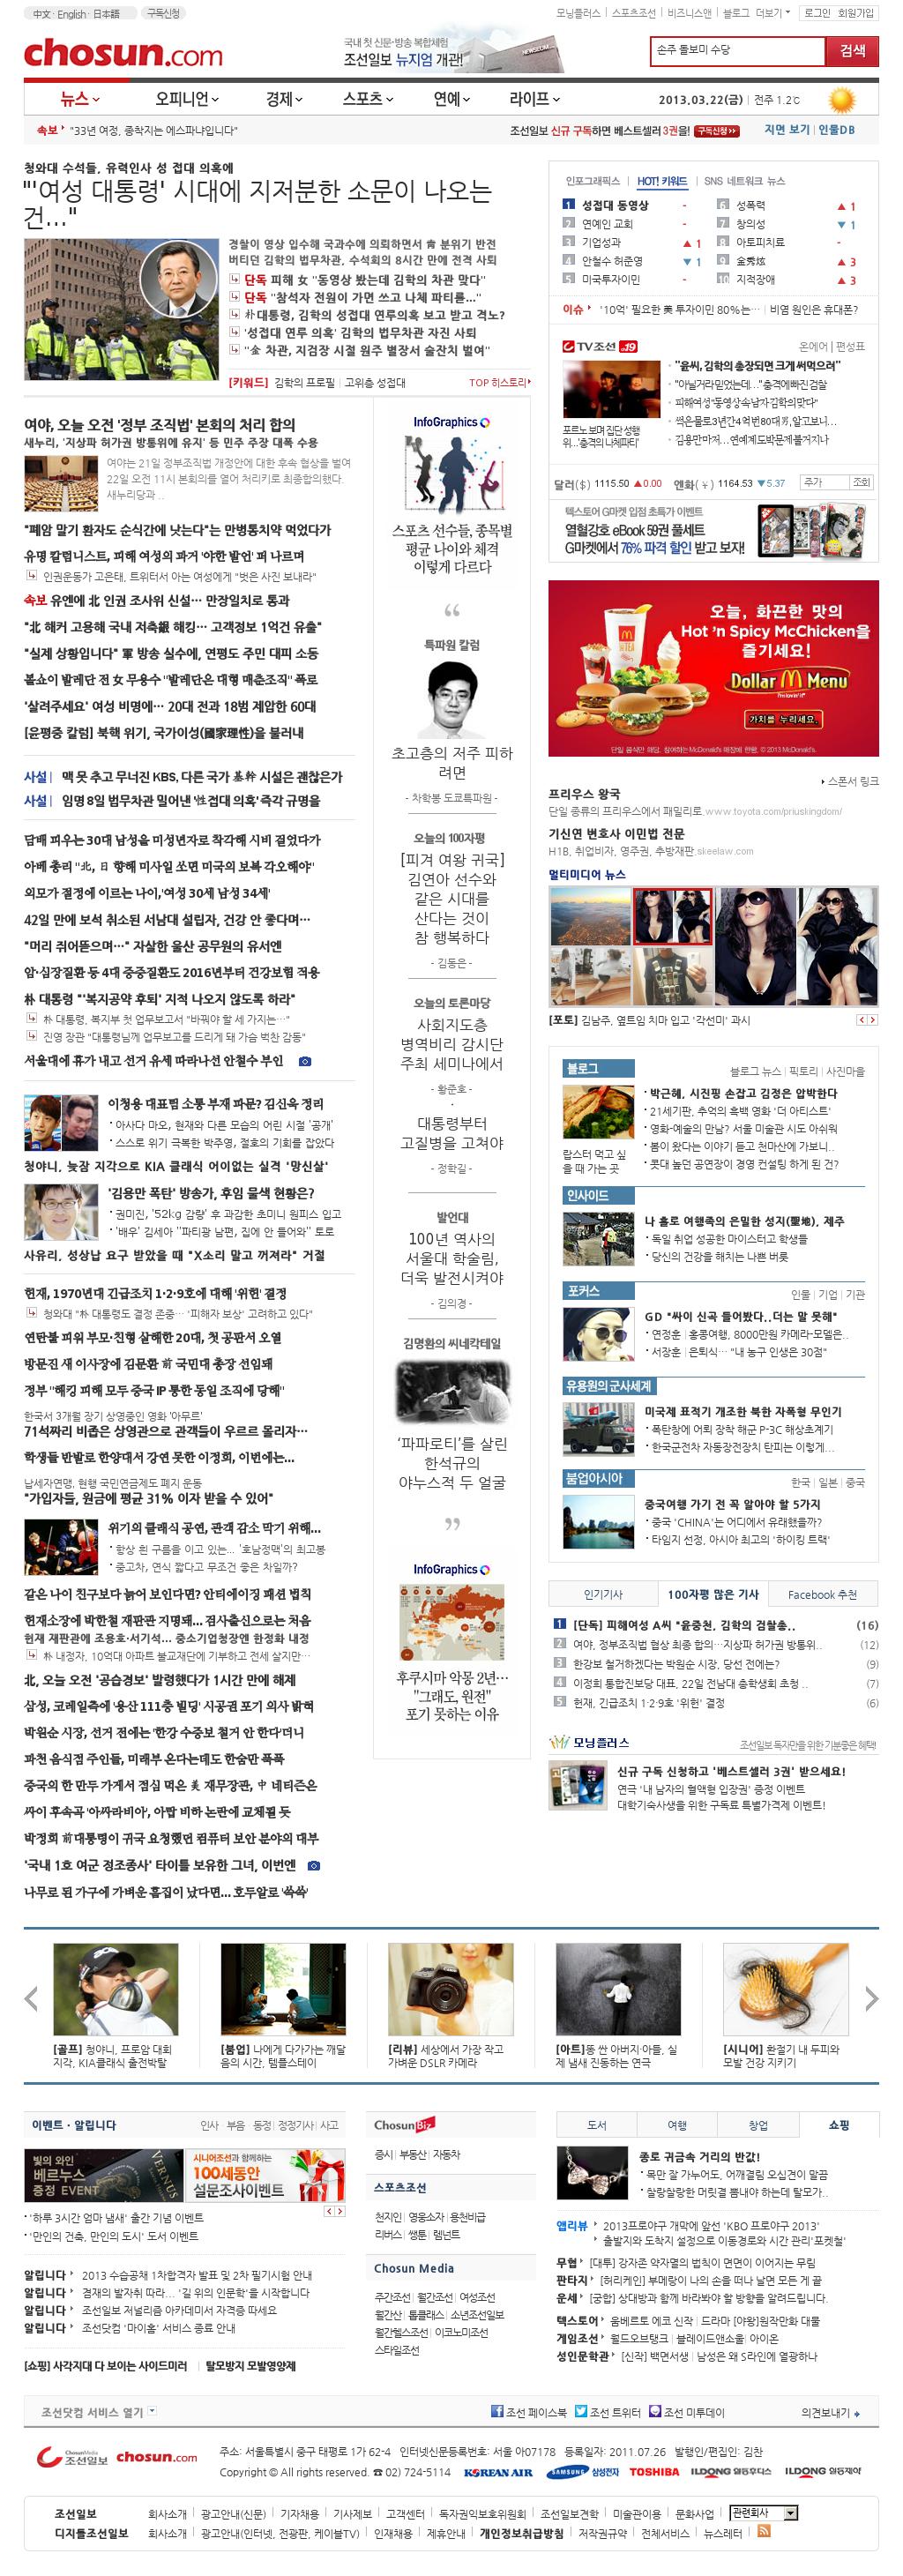 chosun.com at Thursday March 21, 2013, 8:03 p.m. UTC